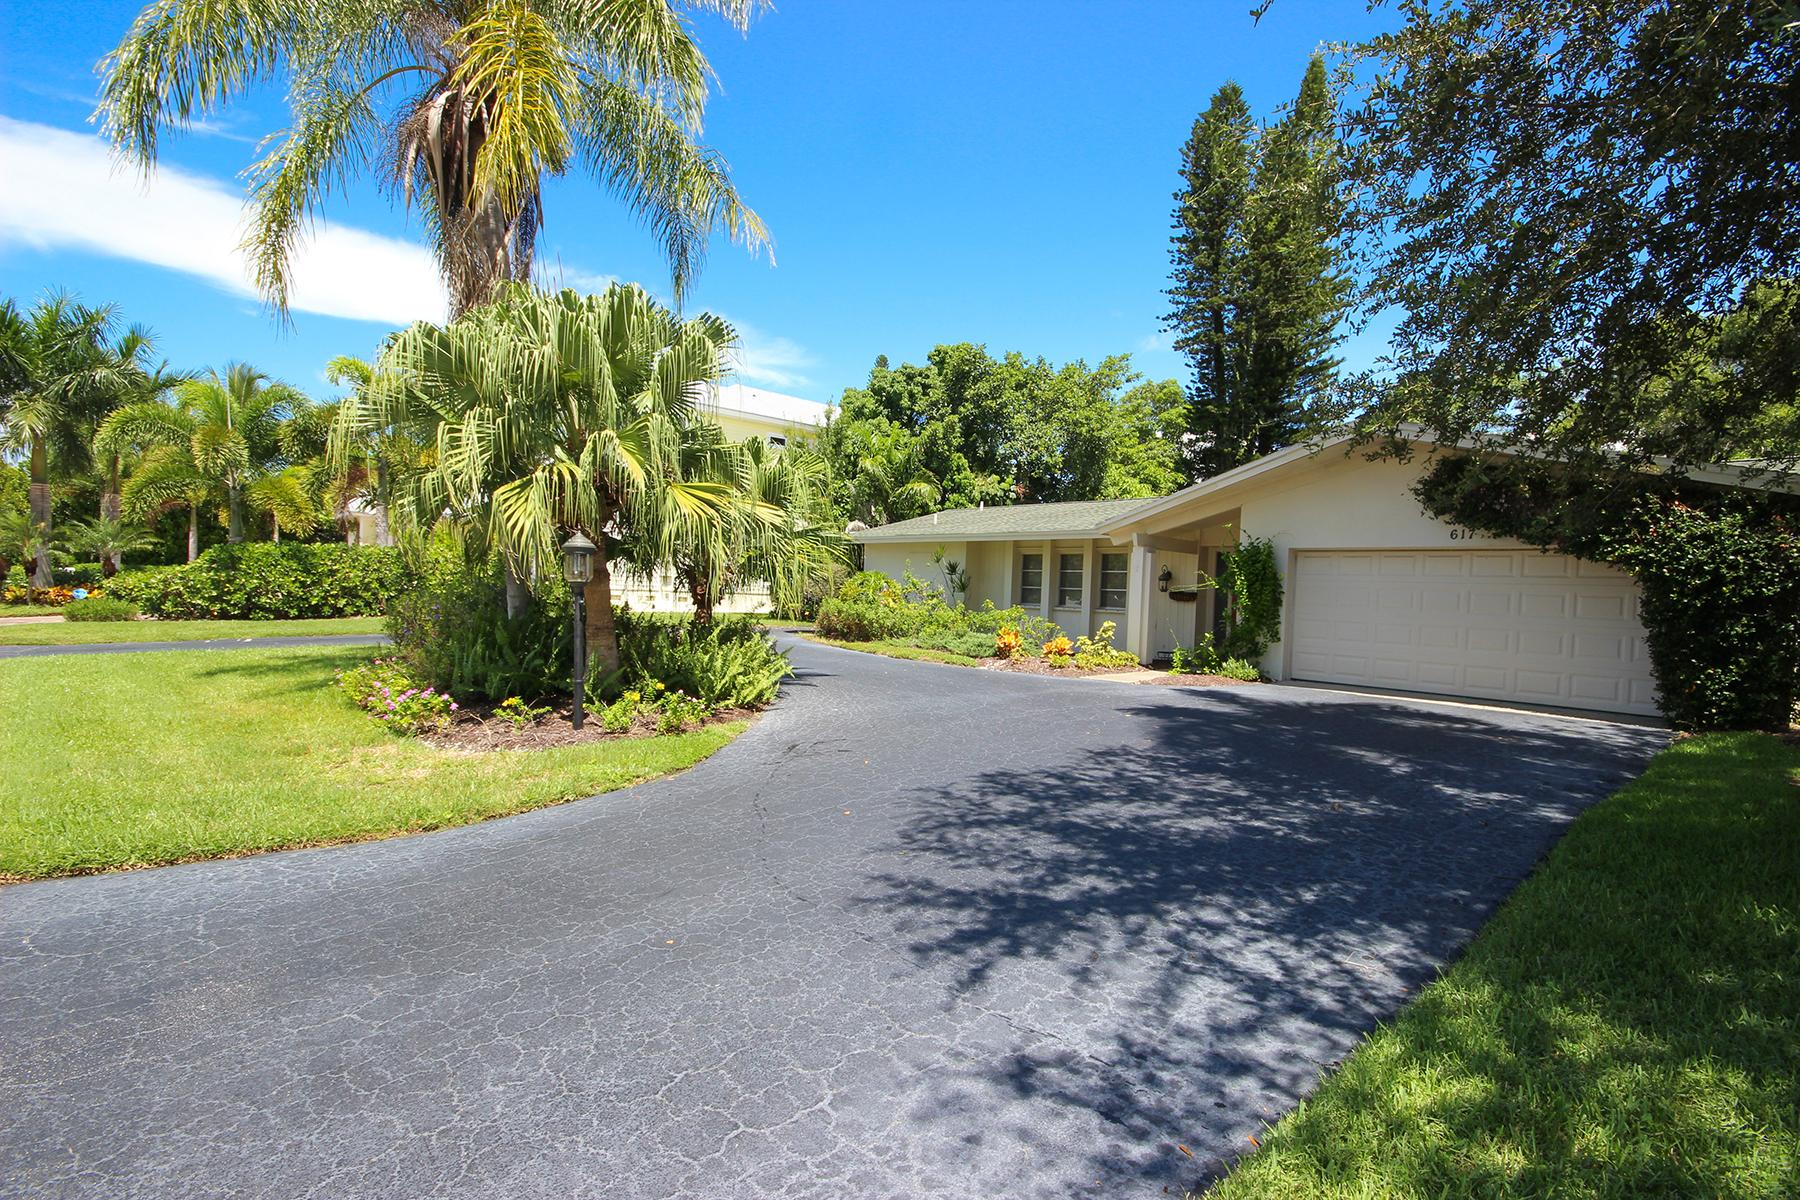 Villa per Vendita alle ore THE MOORINGS 617 Binnacle Dr Naples, Florida 34103 Stati Uniti